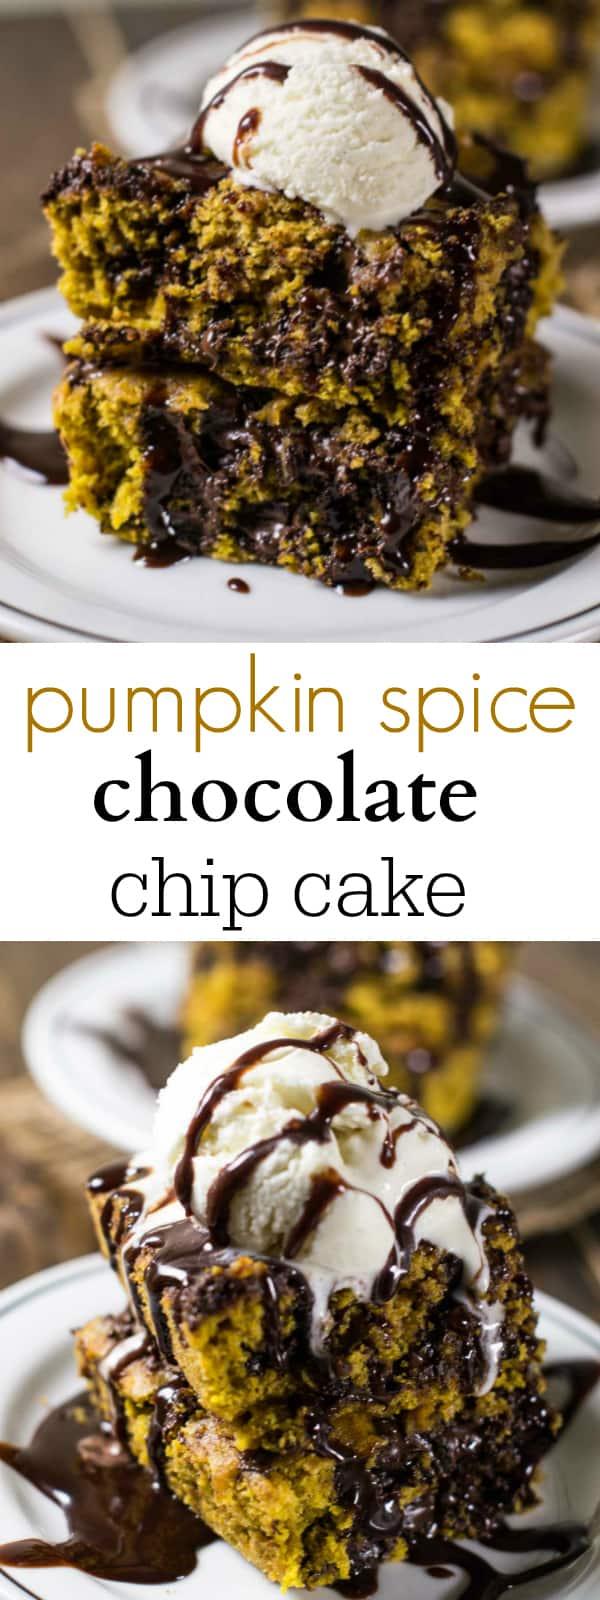 pumpkin spice chocolate chip cake